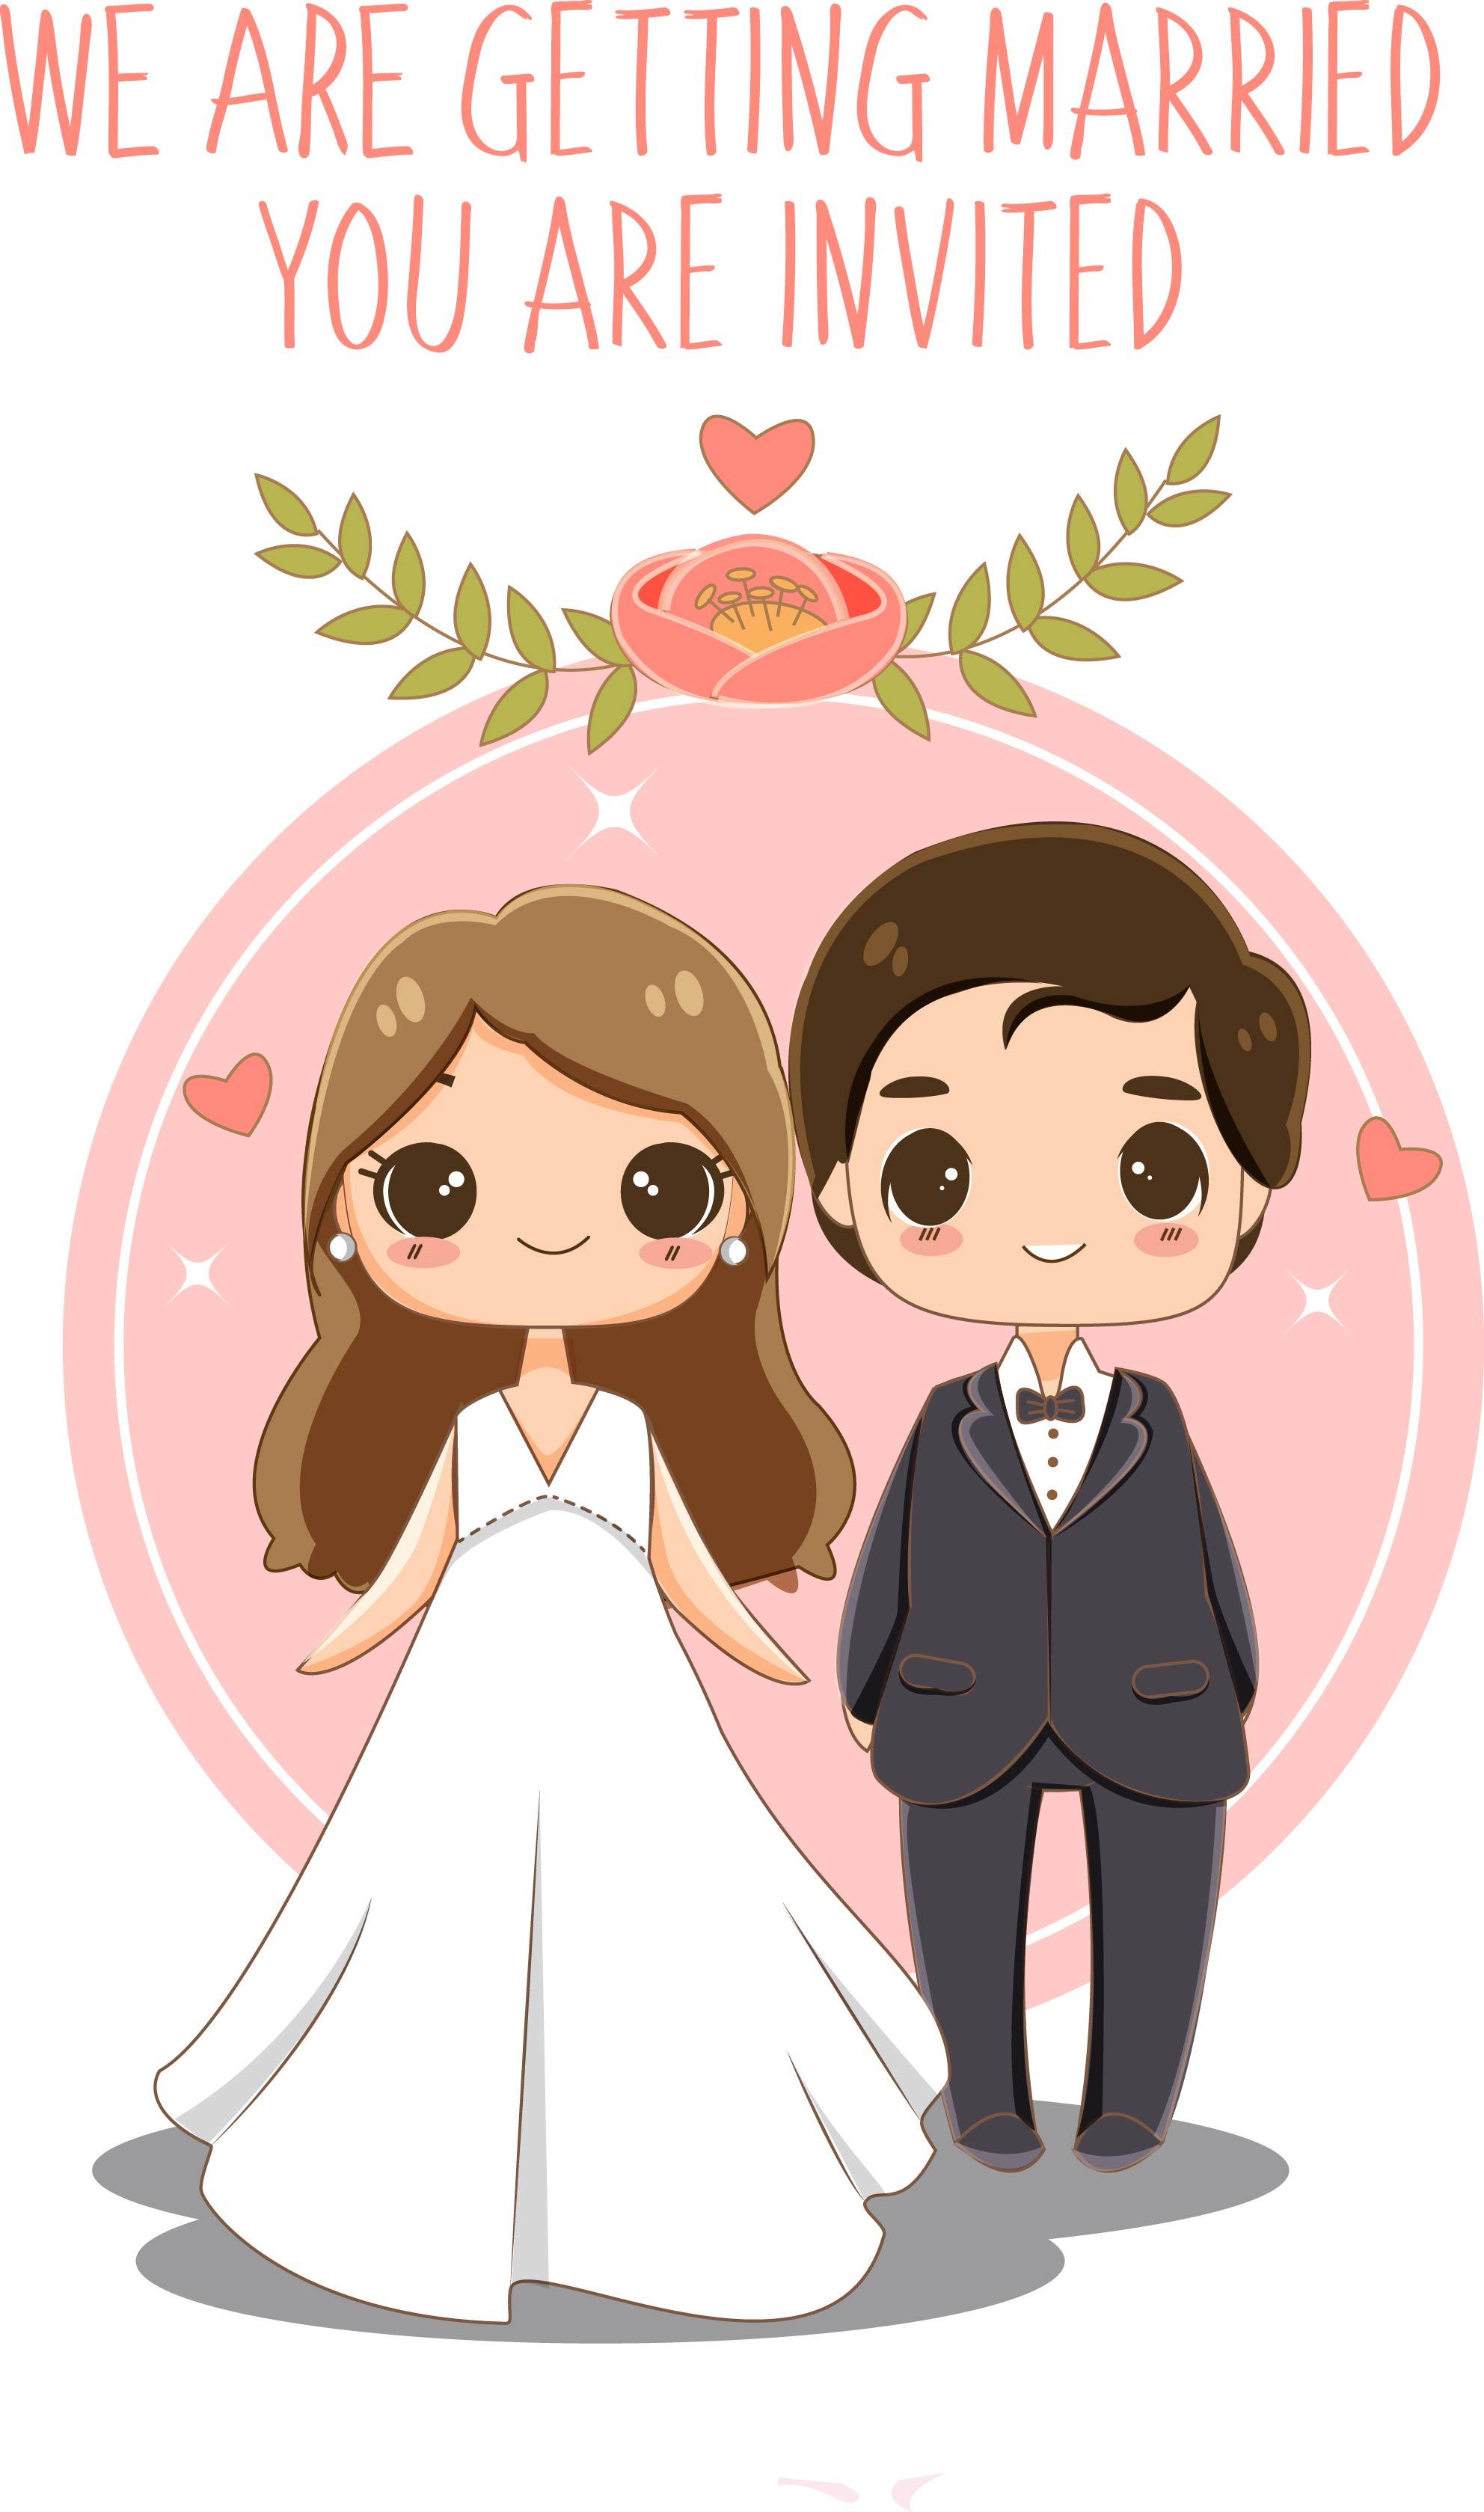 Cute Bride And Groom For Wedding Invitations Card Download Free Vectors Clipart Graphics Vector Art